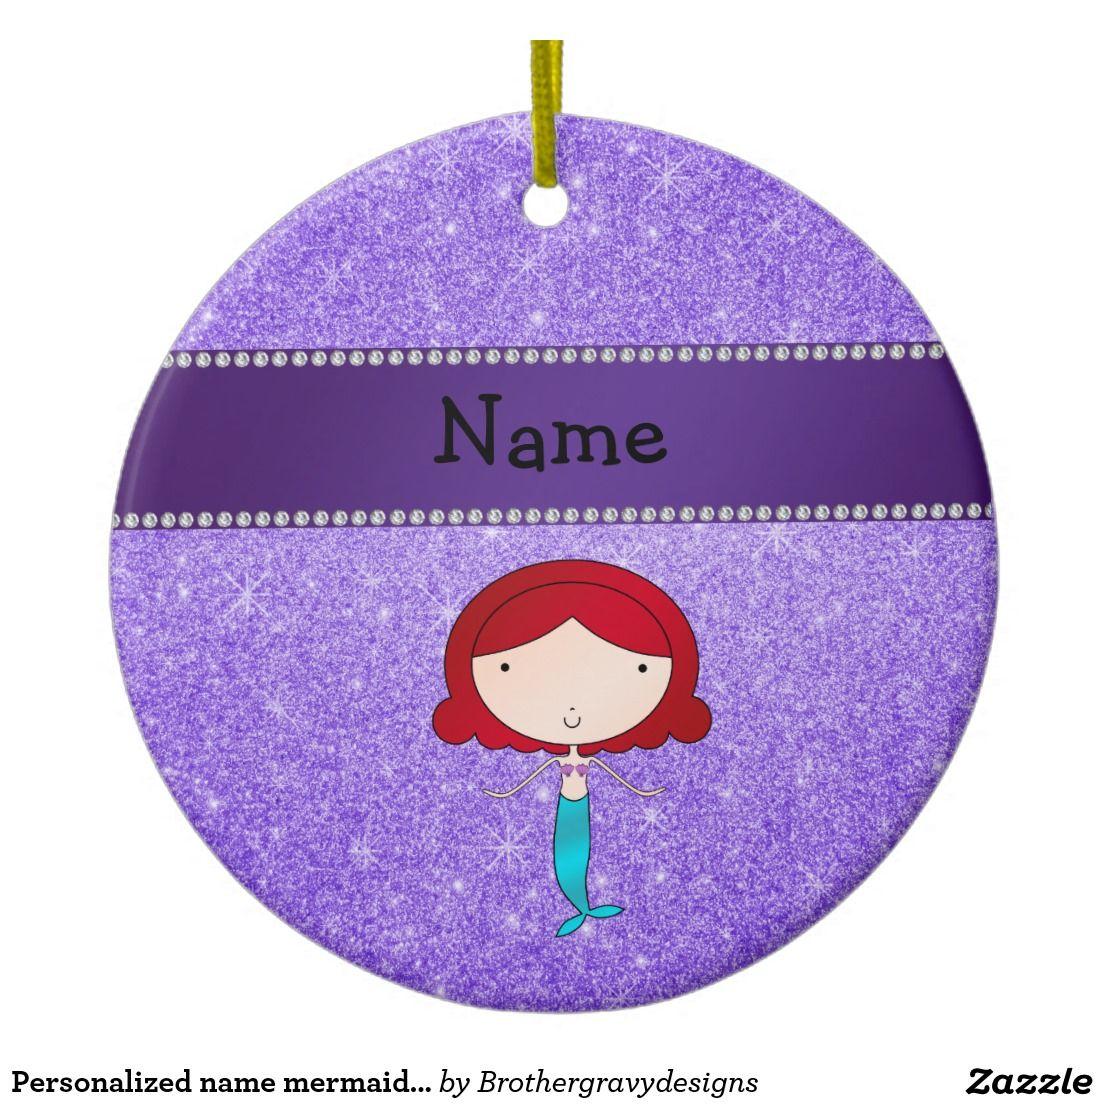 Personalized name ornaments - Personalized Name Mermaid Purple Glitter Ceramic Ornament